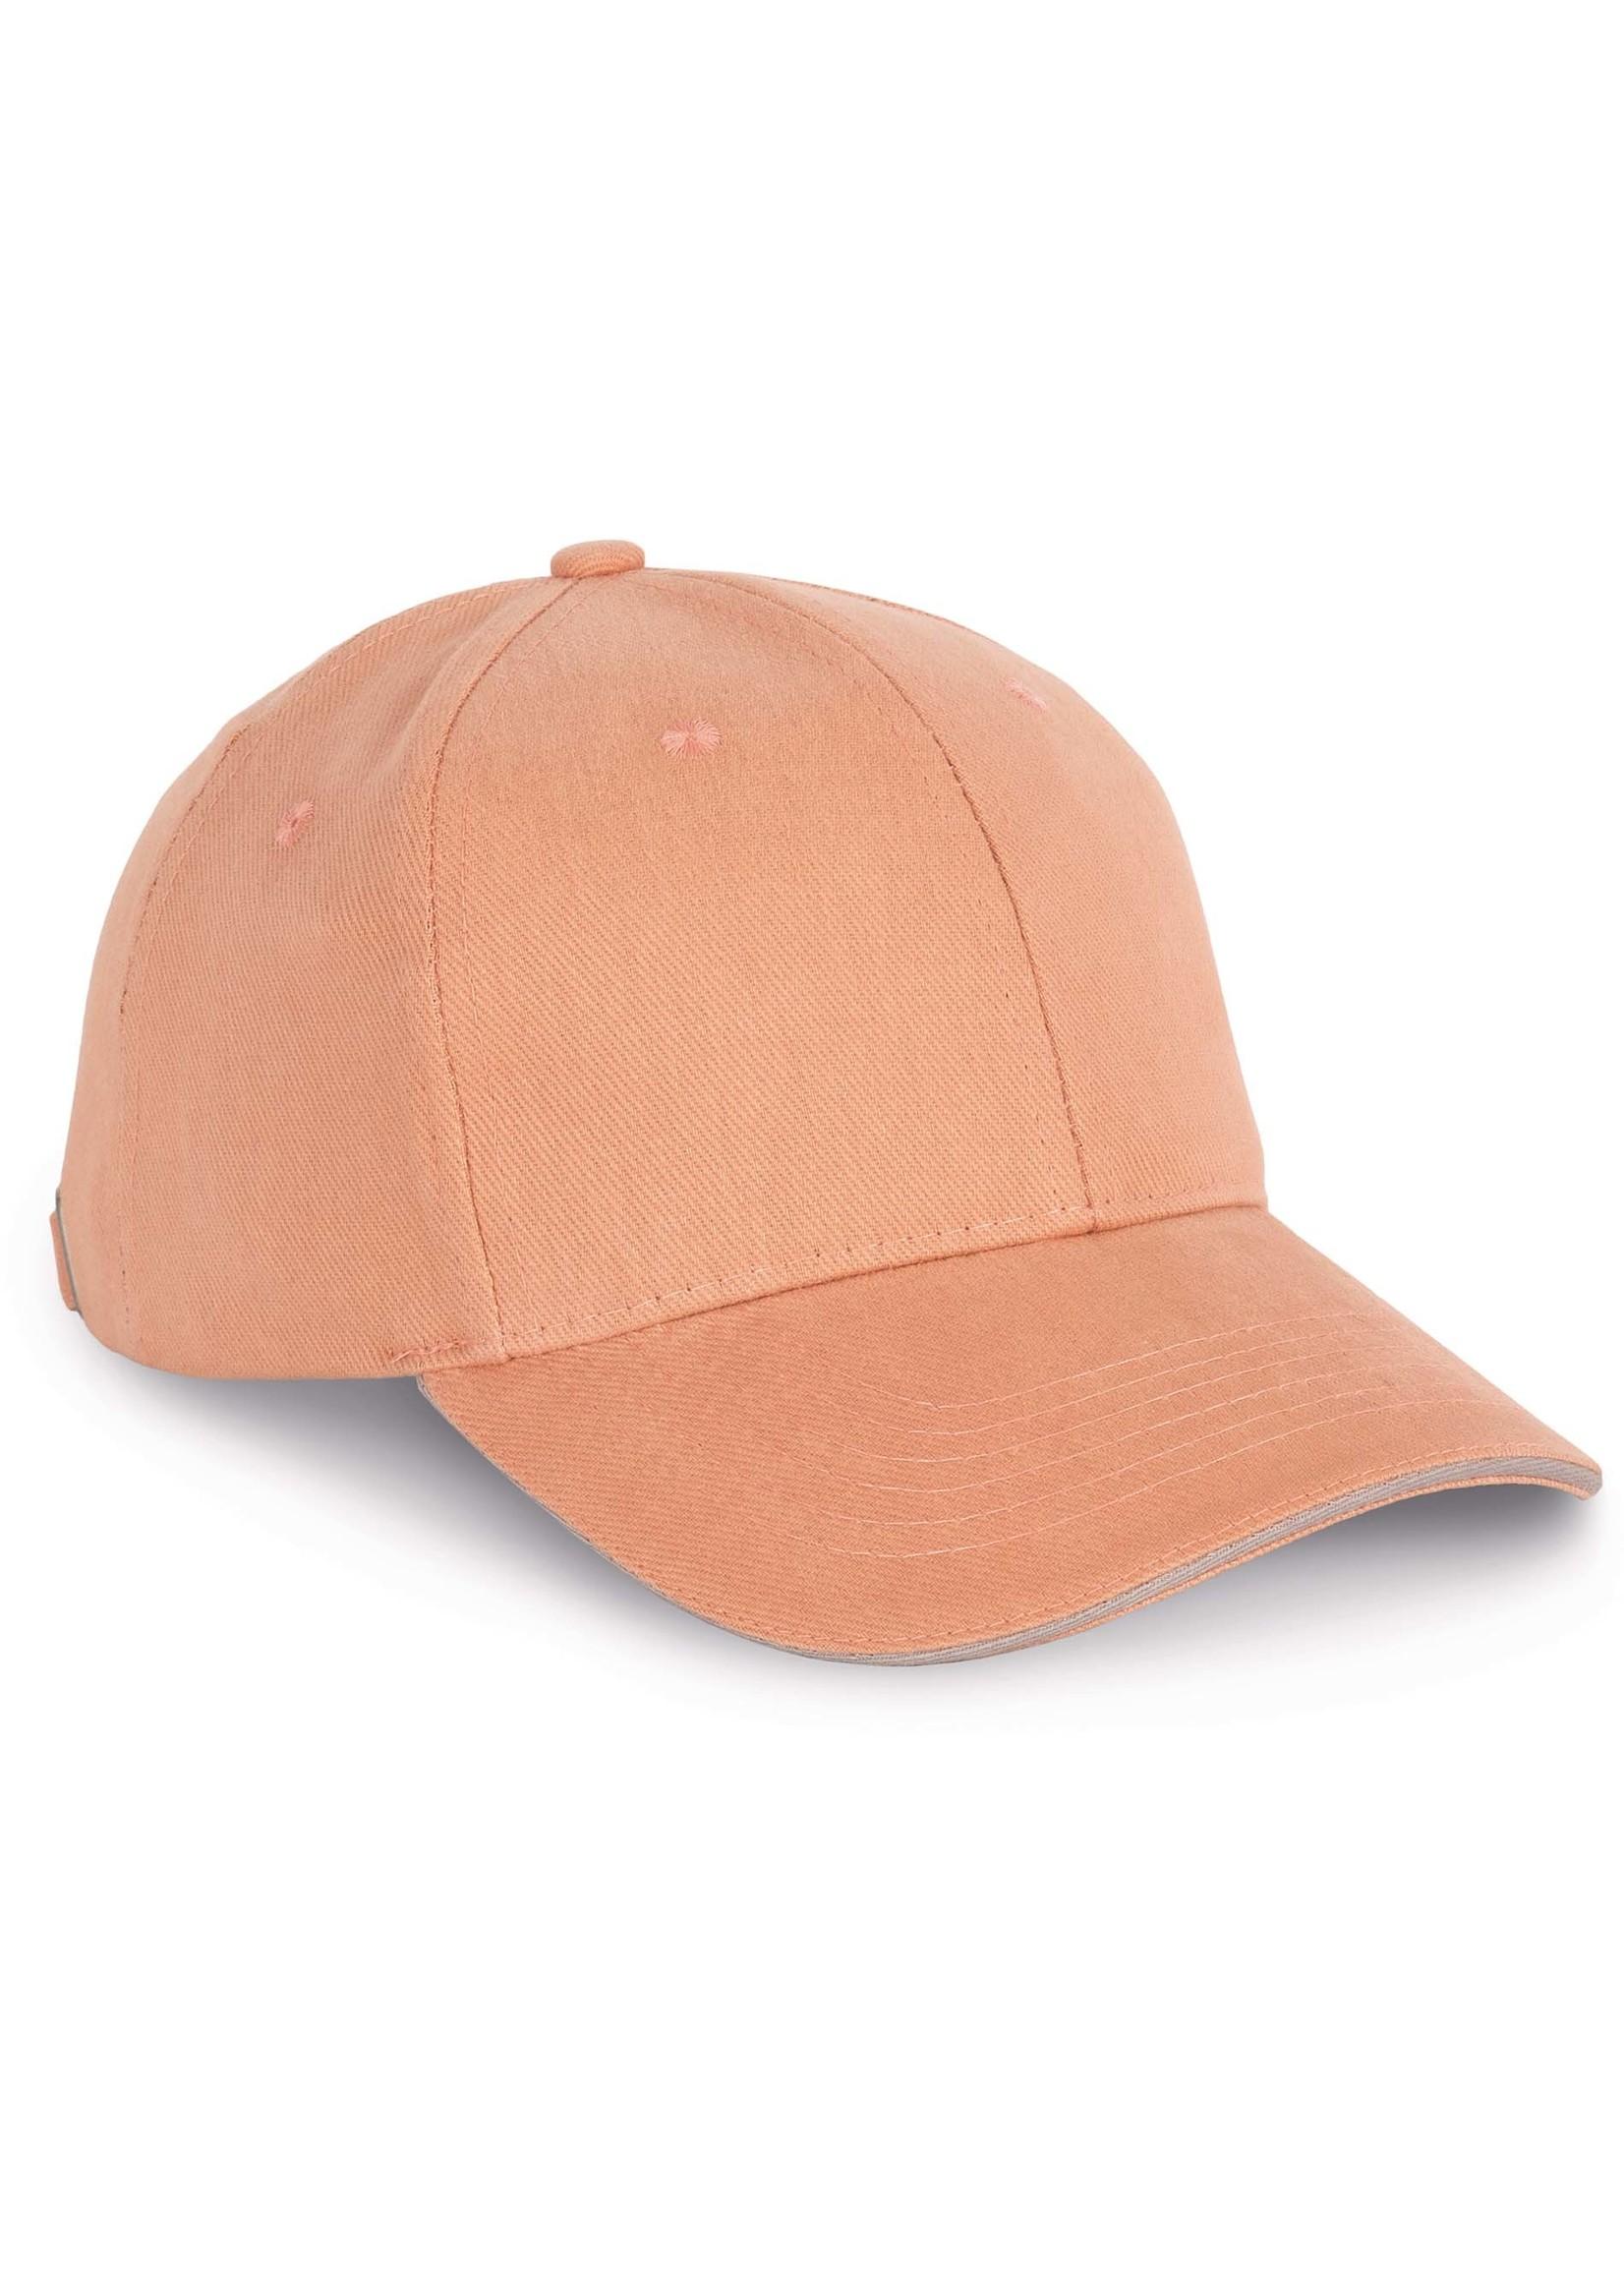 Cap van 100% Biokatoen kleur Sealblue-navyblue